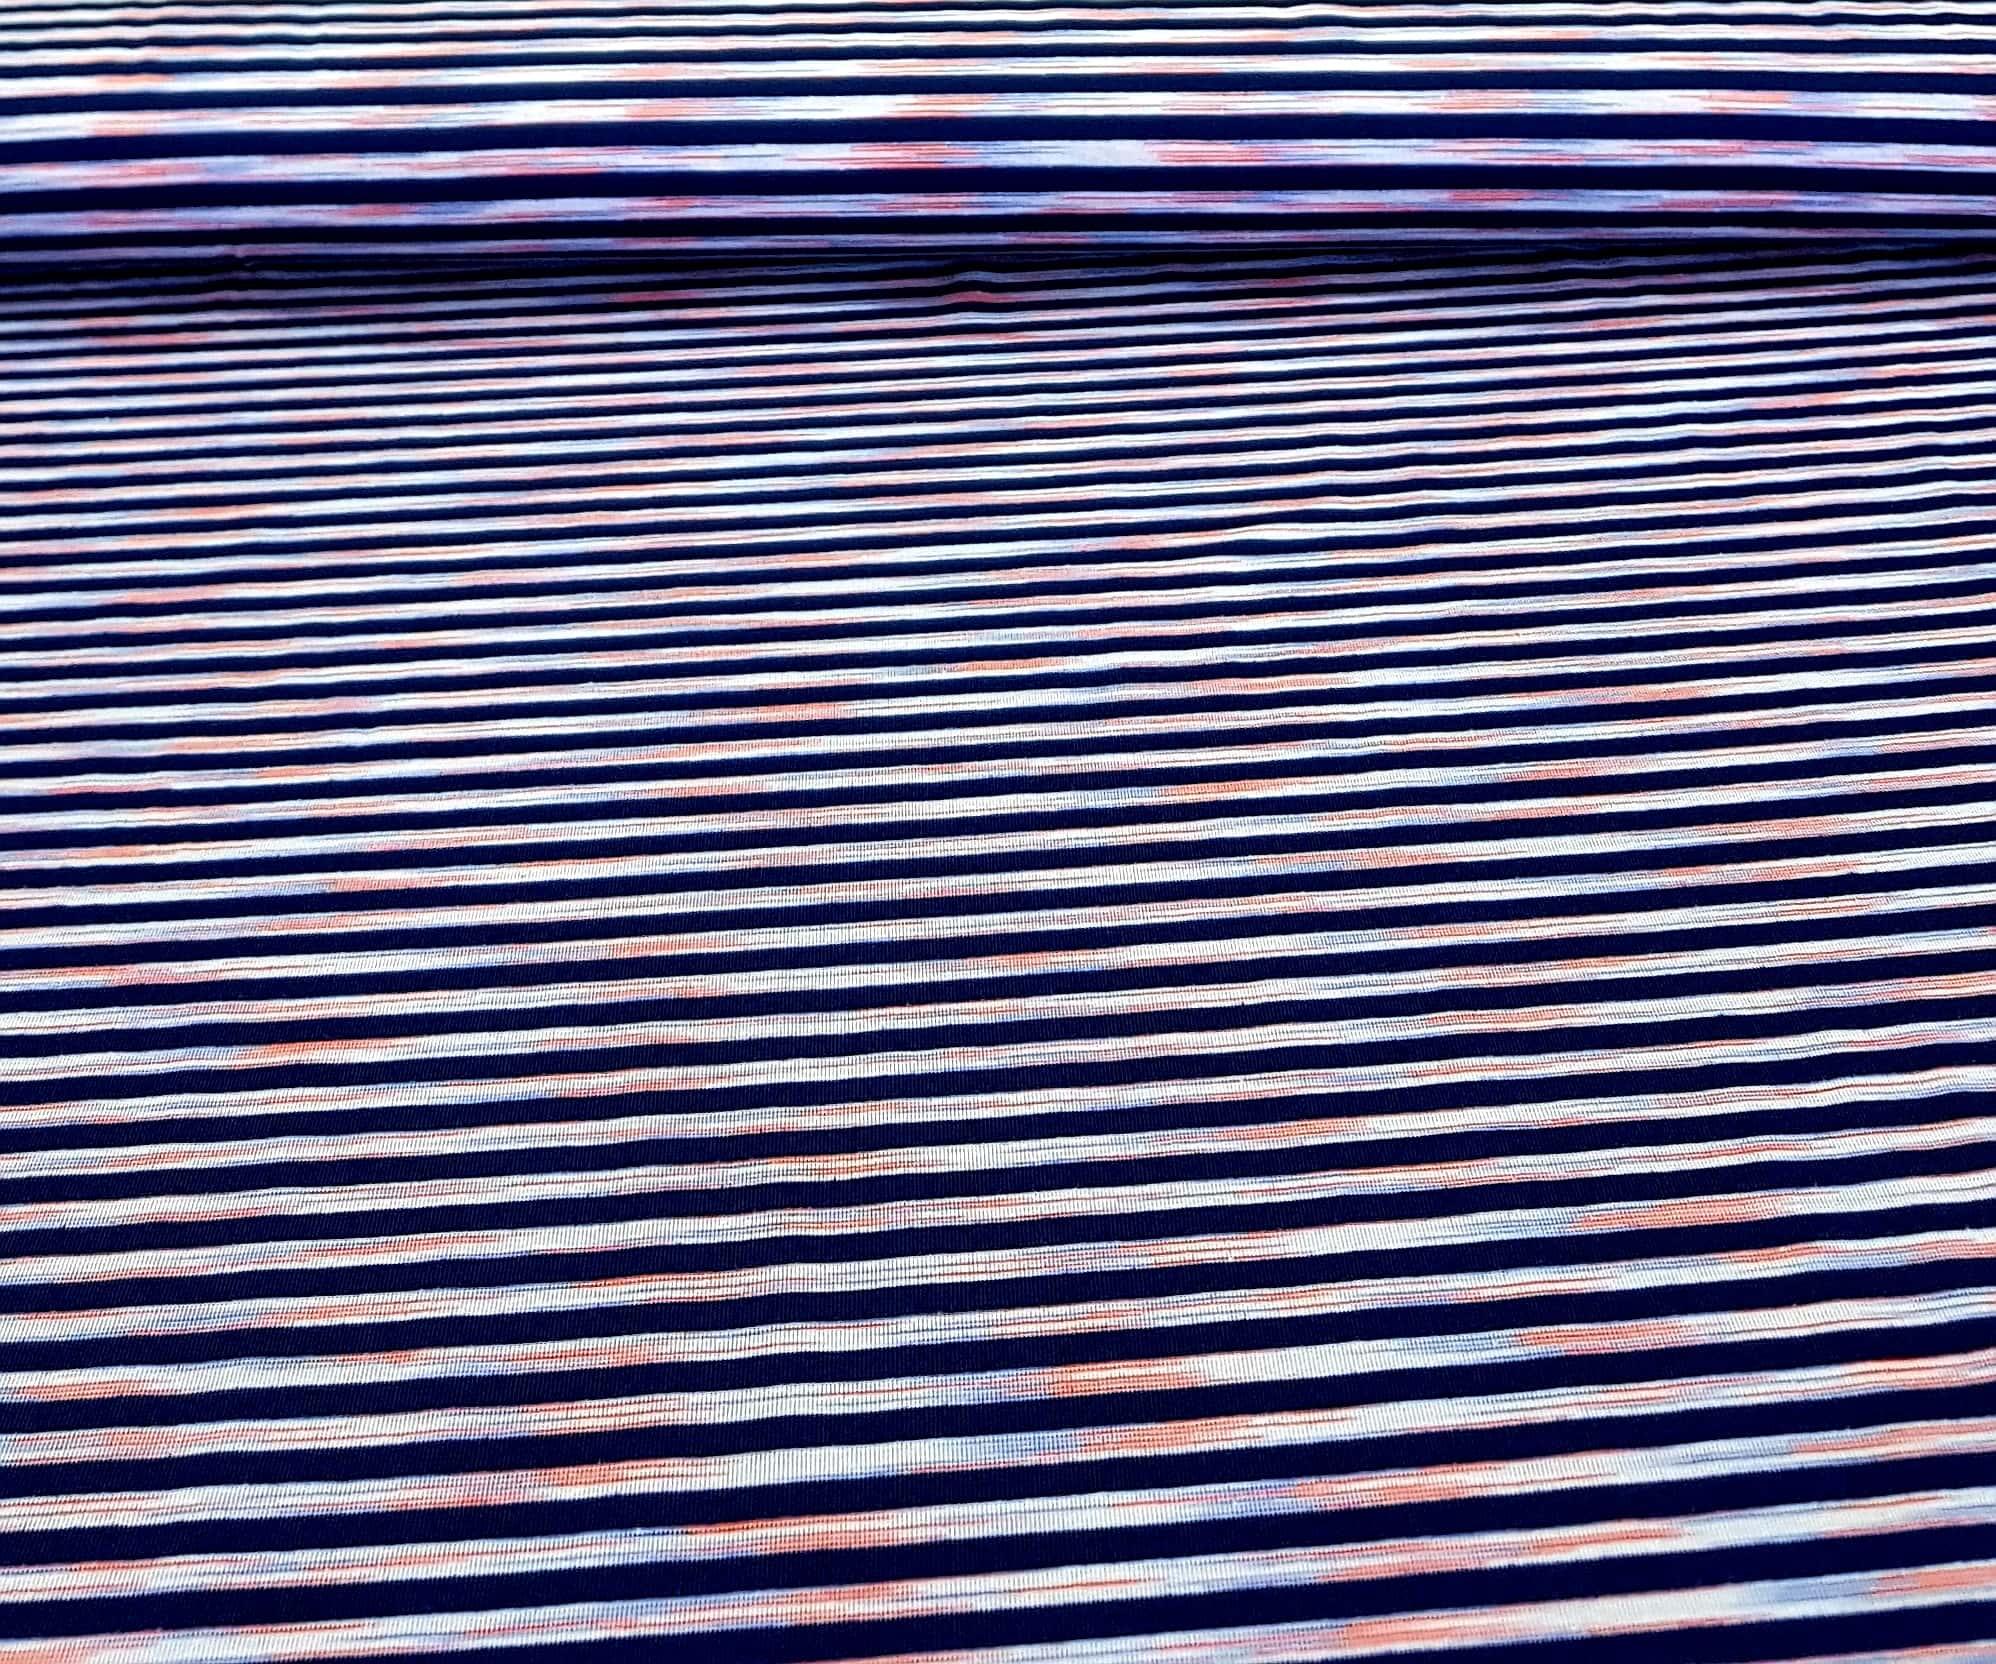 bedruktetricotmetstreepdonkerblauworanje-min